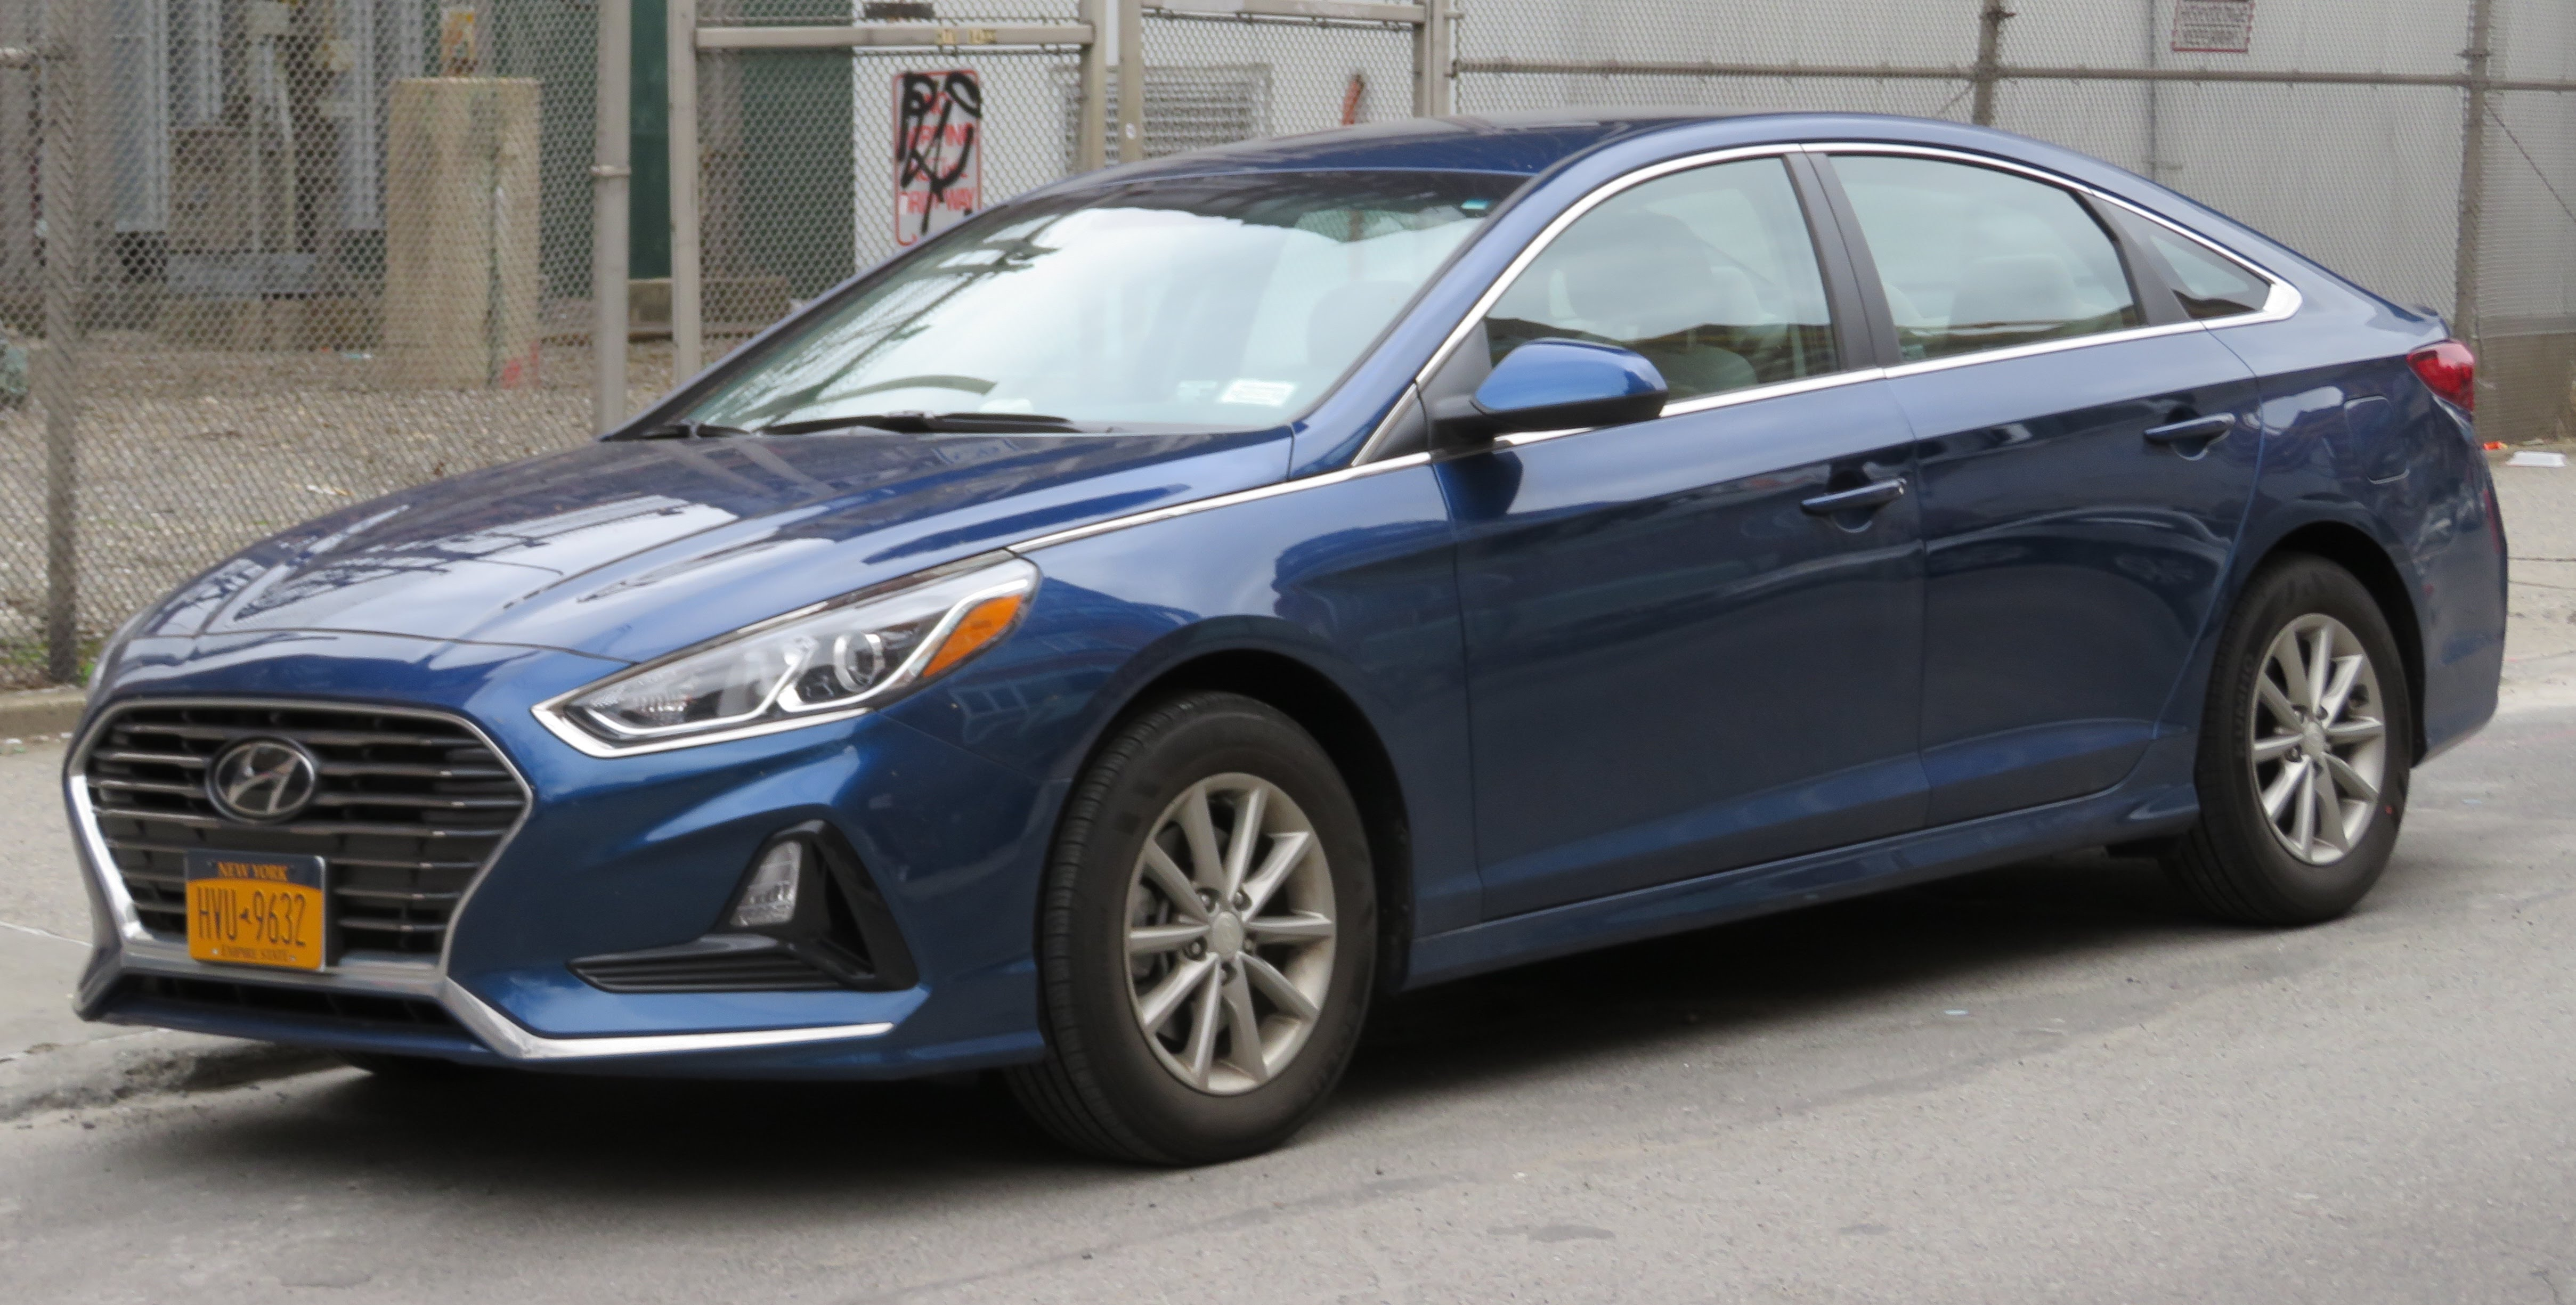 Hyundai Sonata Wikiwand